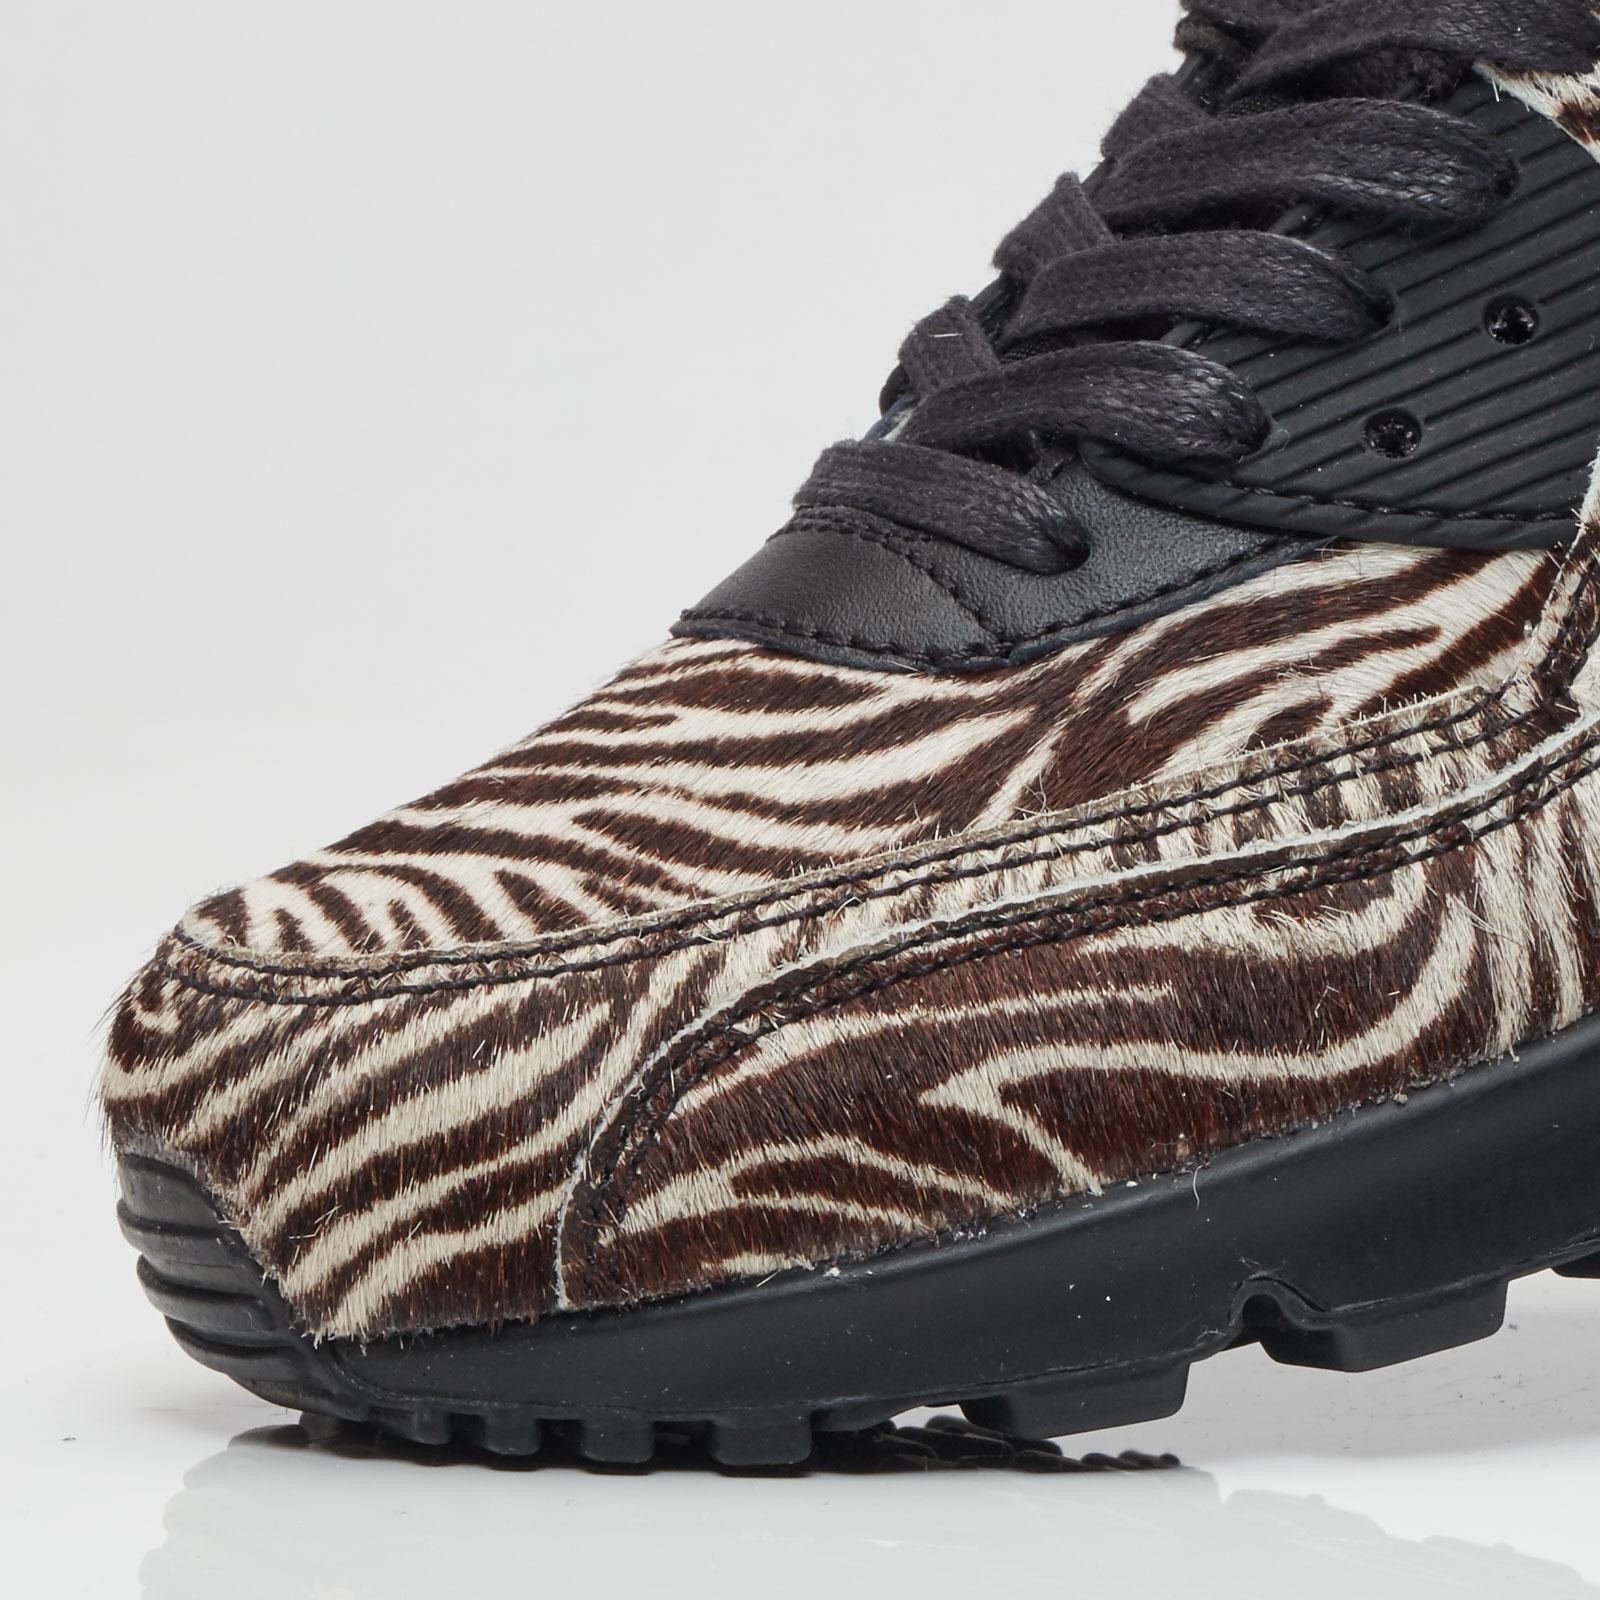 size 40 ce3e4 56d2d Nike Wmns Air Max 90 Lx - 898512-001 - Sneakersnstuff | sneakers &  streetwear online since 1999